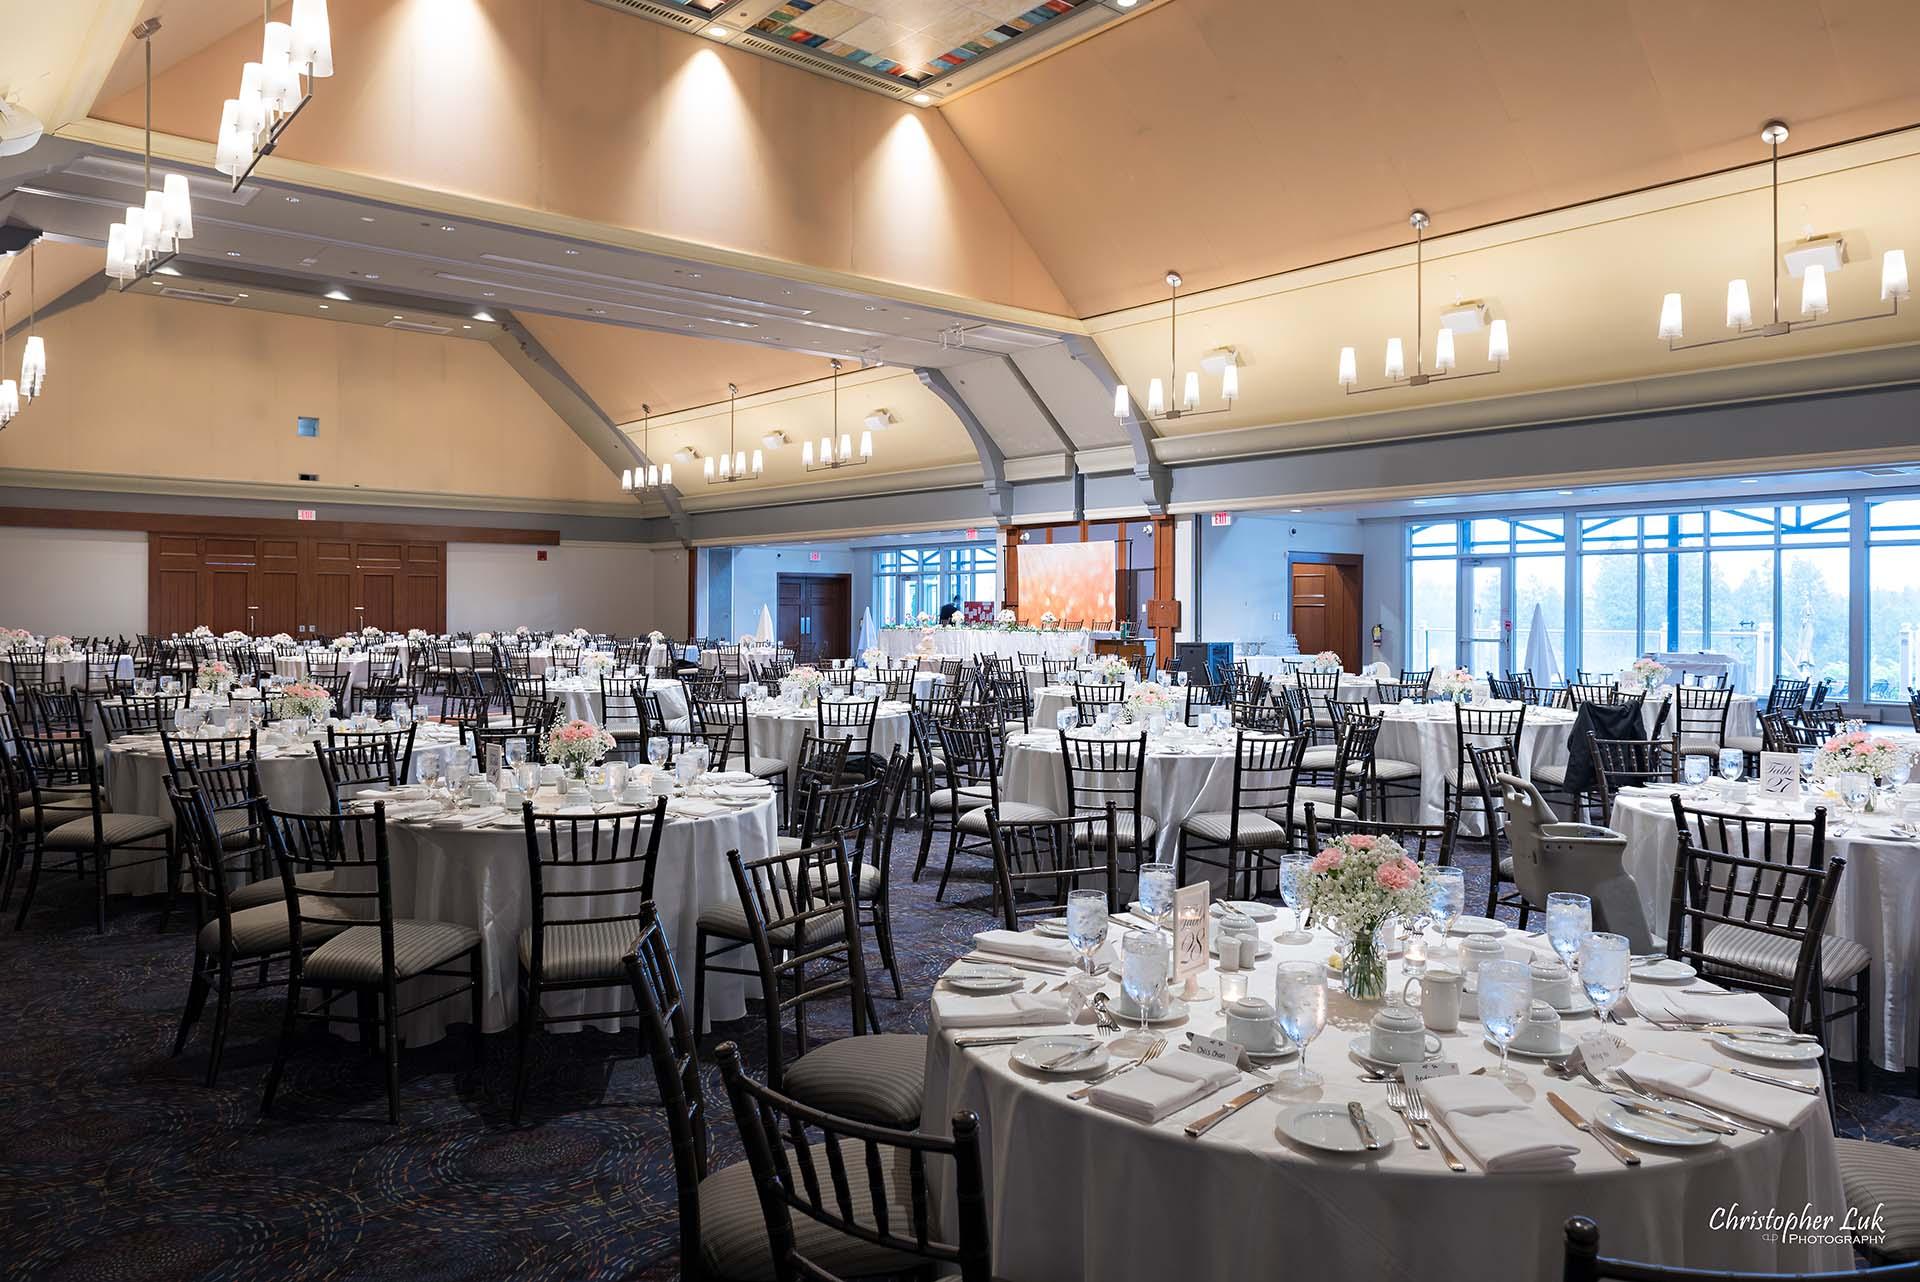 Christopher Luk Toronto Wedding Photographer Angus Glen Golf Club Markham Great Hall Dinner Reception Event Venue Round Tables Chiavari Chairs Wide Room Angle Corner